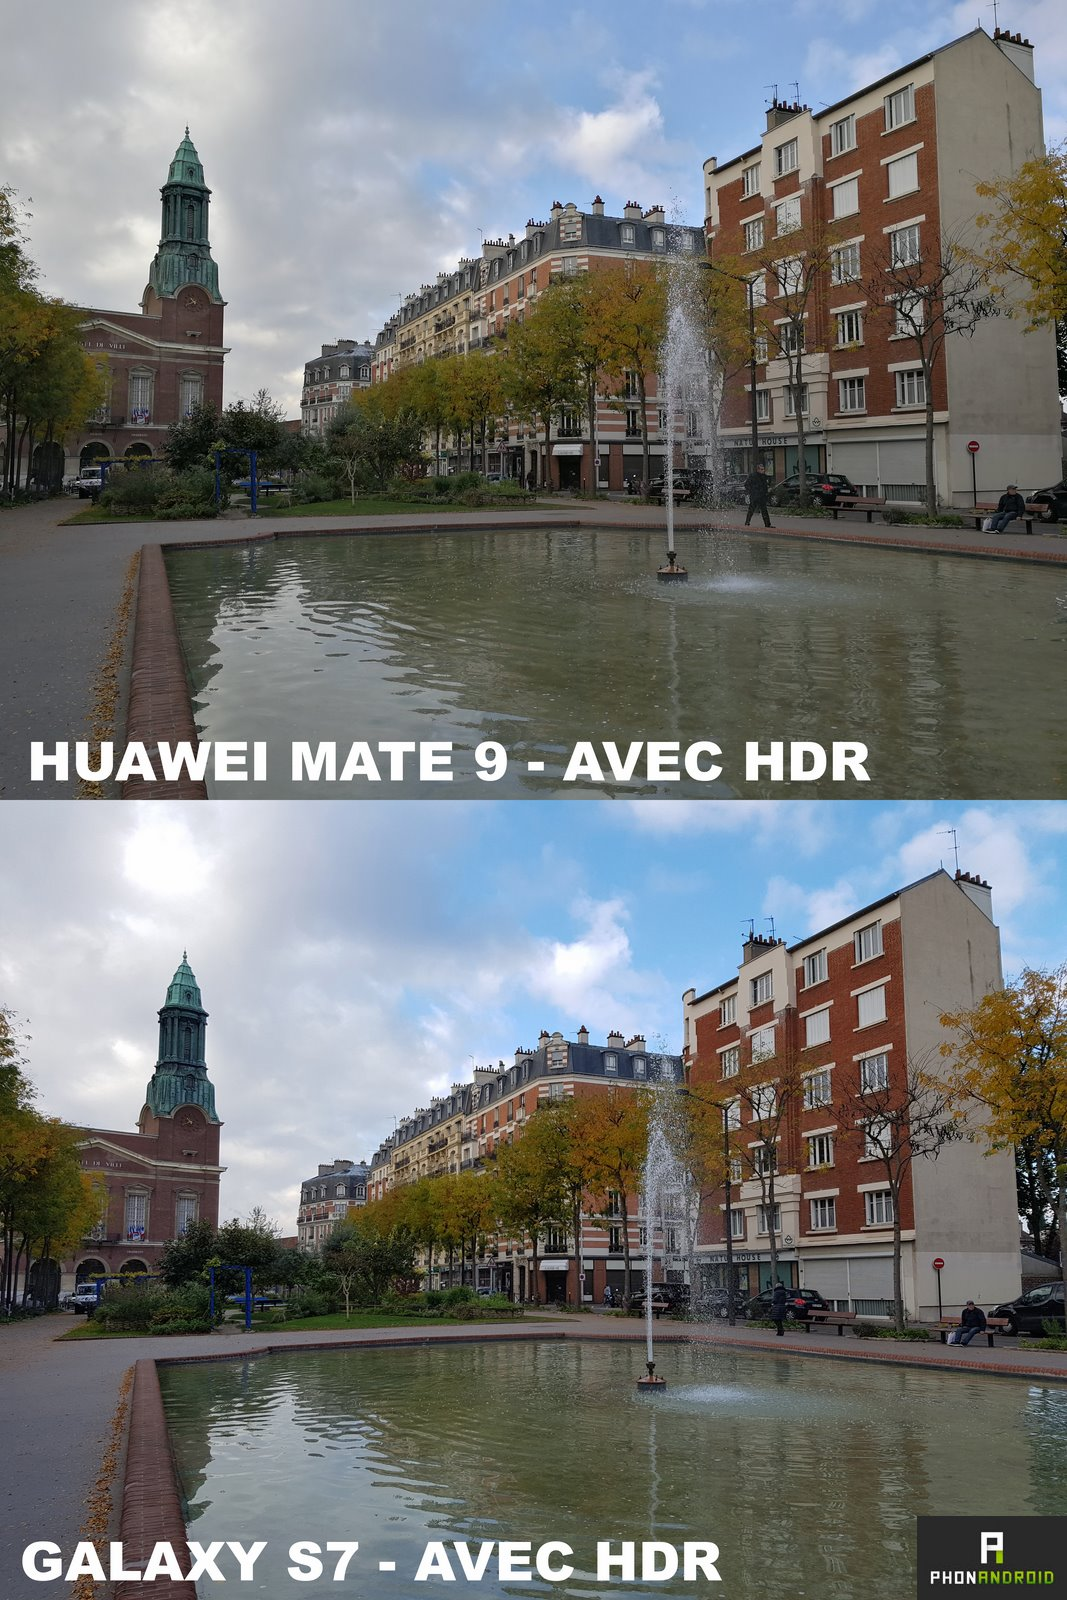 huawei mate 9 galaxy s7 hdr